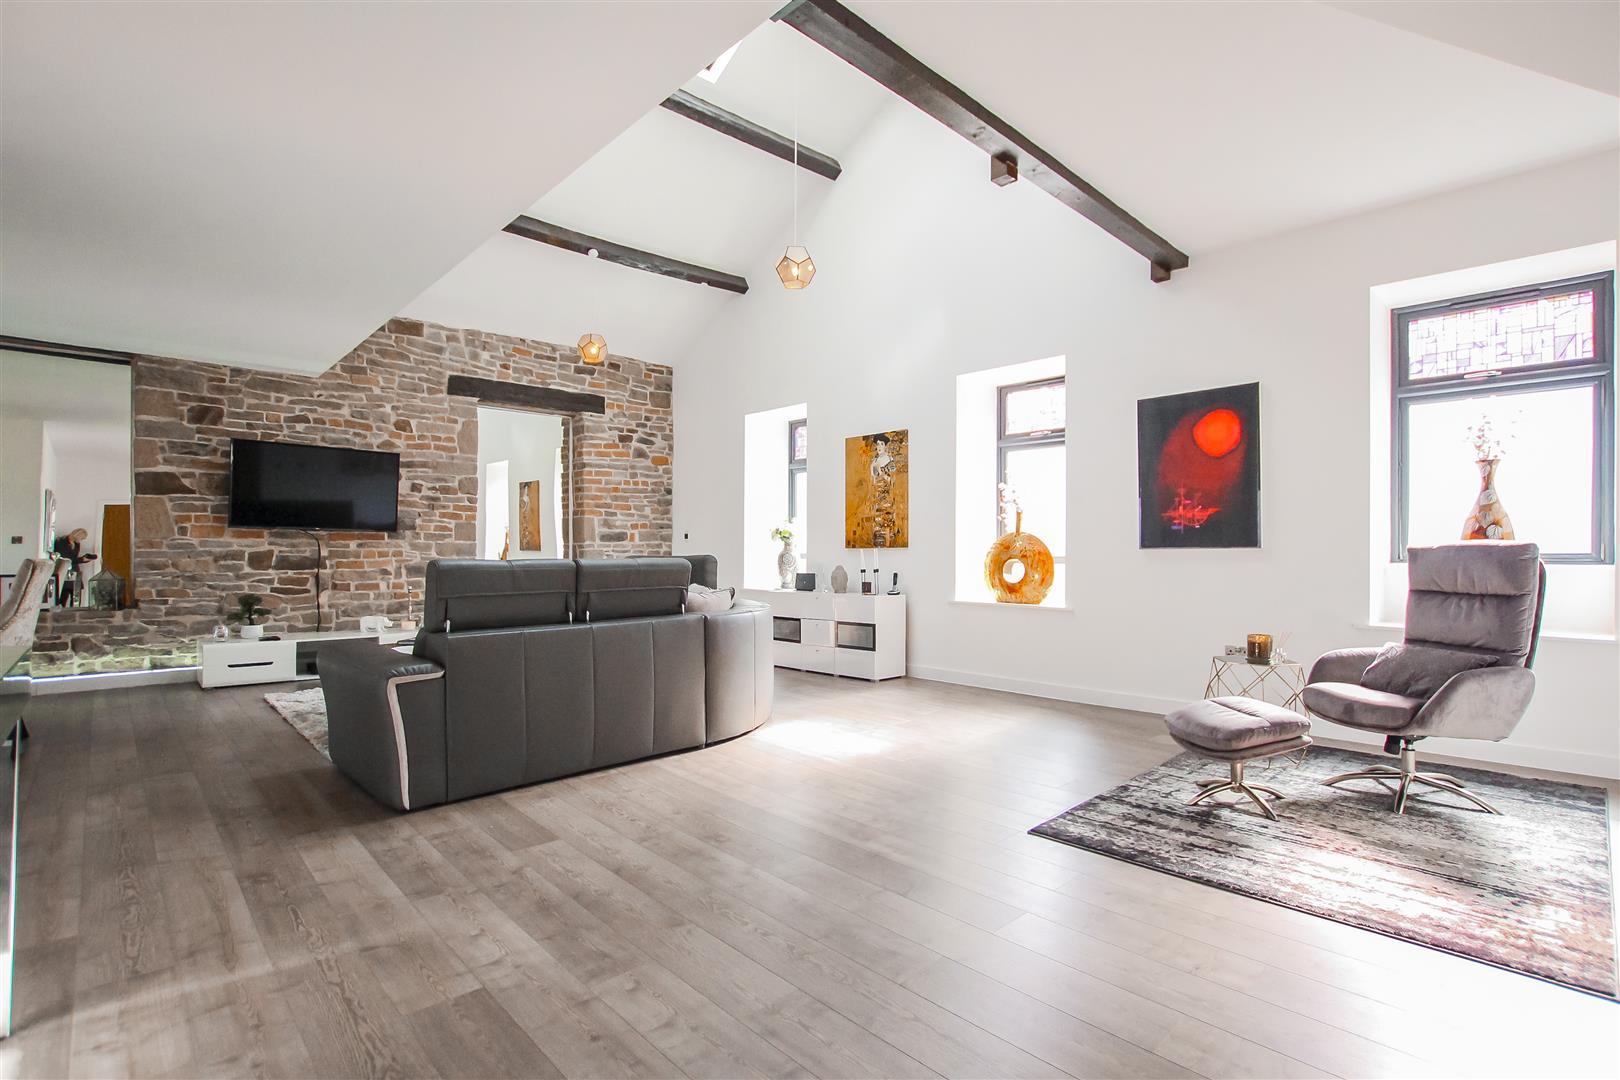 3 Bedroom Duplex Apartment For Sale - Image 21